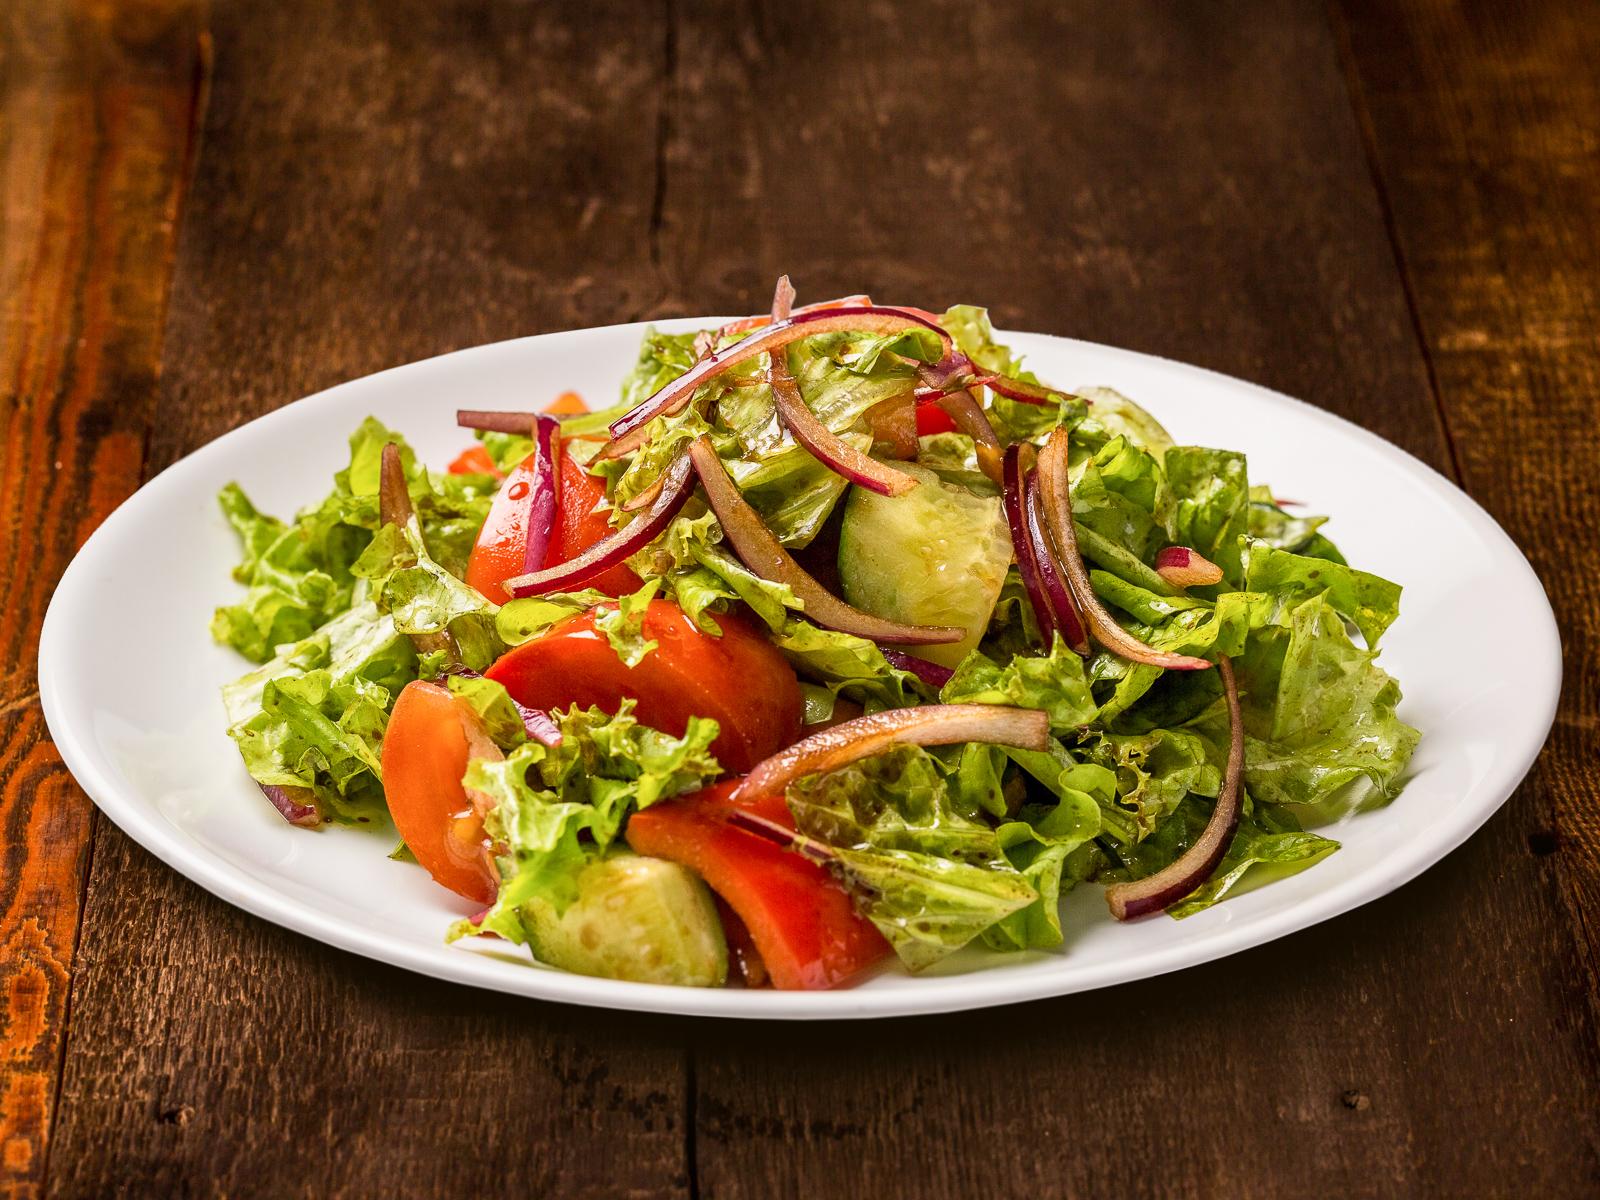 Салат Микс из овощей и зелени